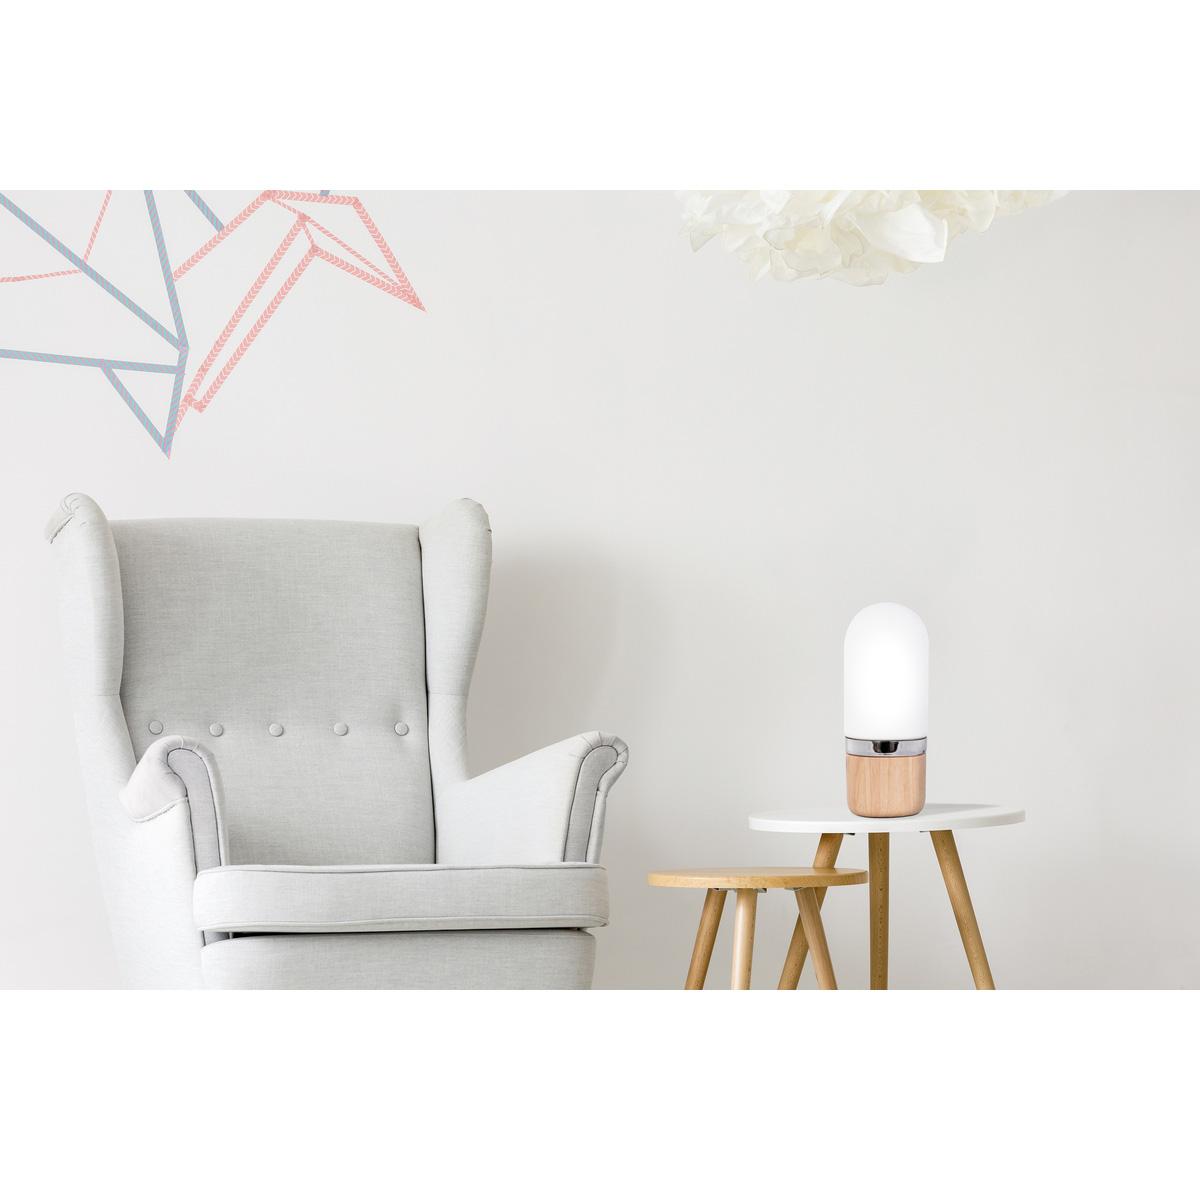 Wit klein lampje kopen  Lampen  verlichting